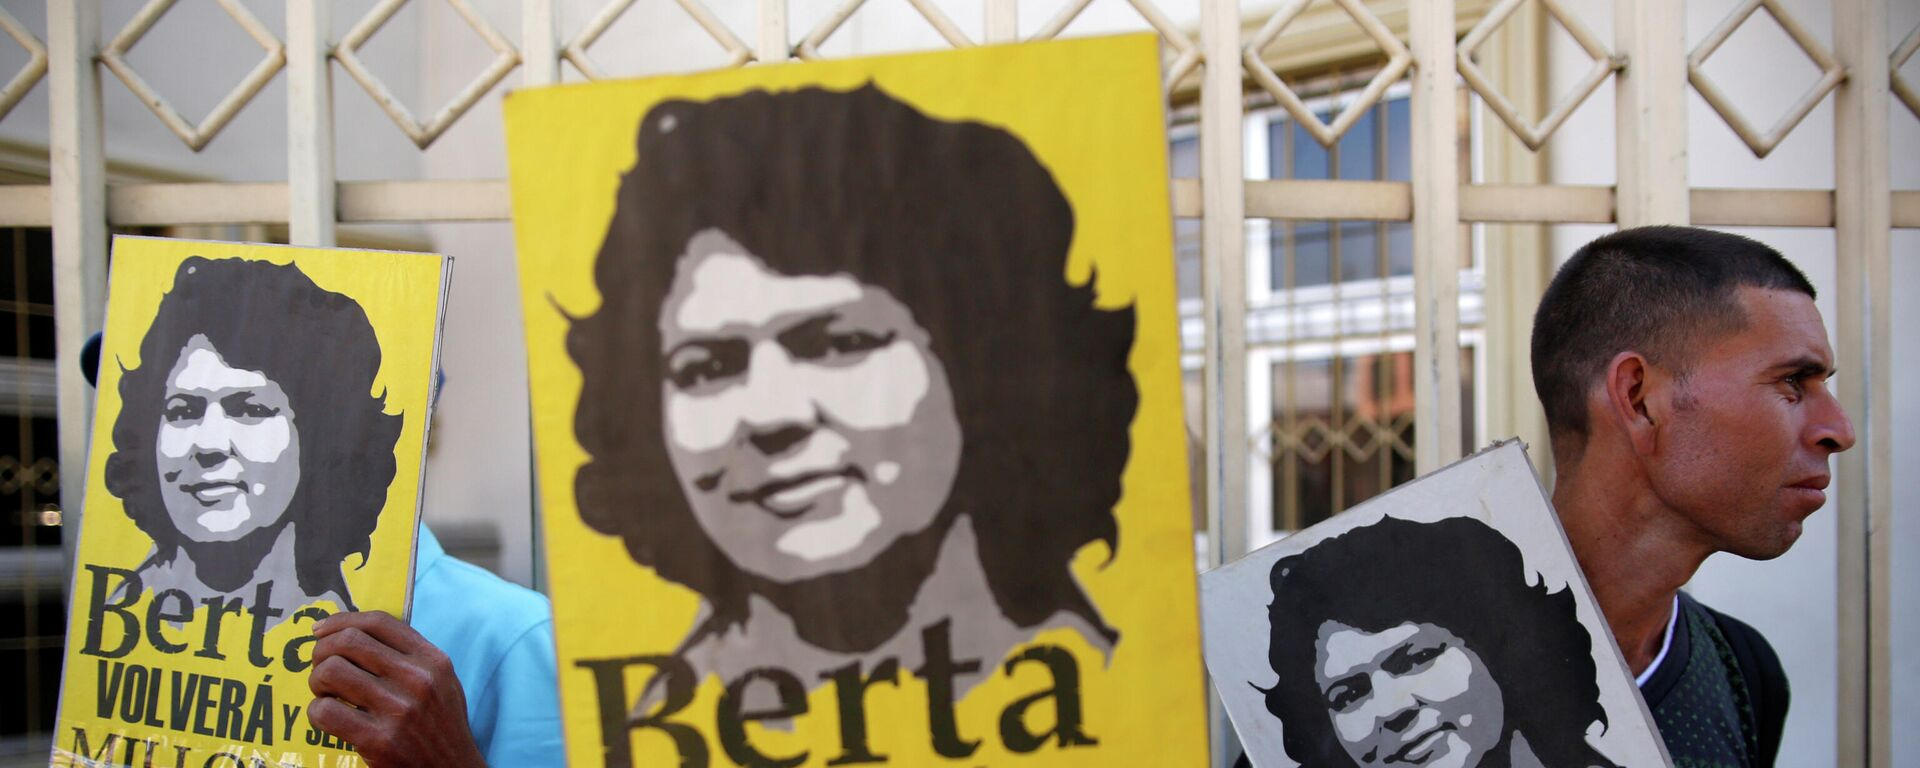 Pancartas con la imagen de Berta Cáceres - Sputnik Mundo, 1920, 02.03.2021